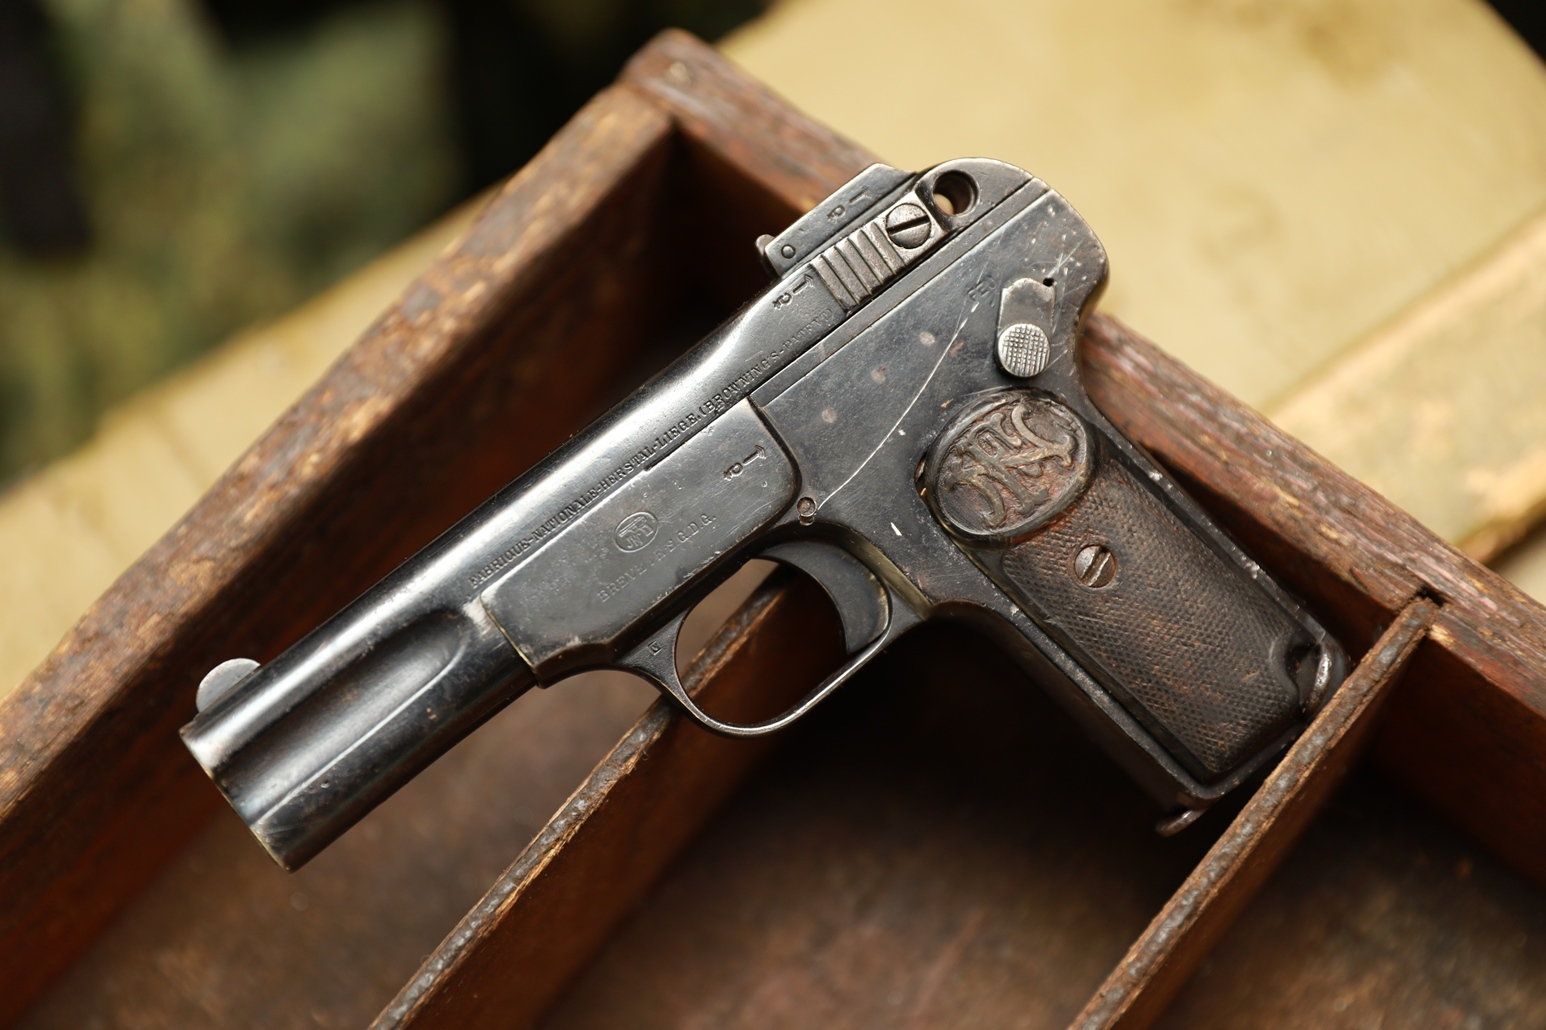 Пистолет Browning FN1900 #44766, очень бюджетно